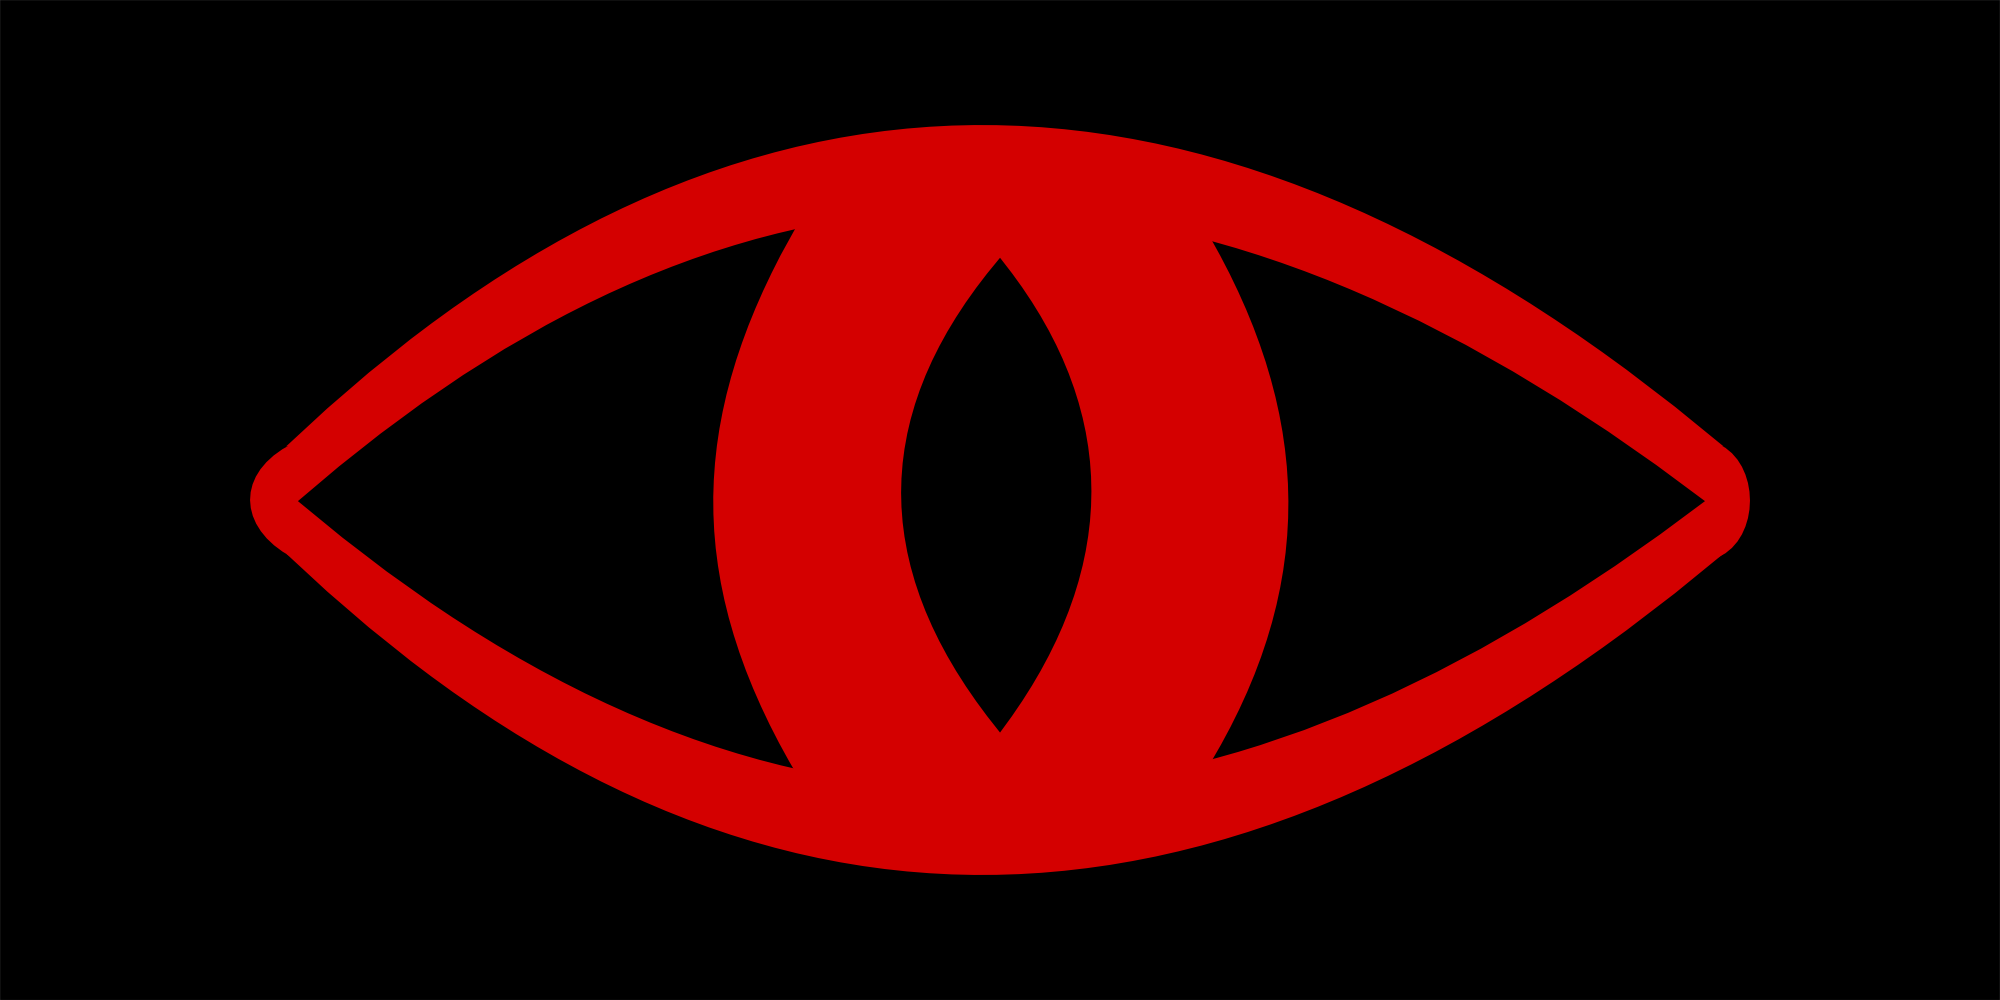 Eye Of Sauron Banner Design Banner Design Illusions Magic Team